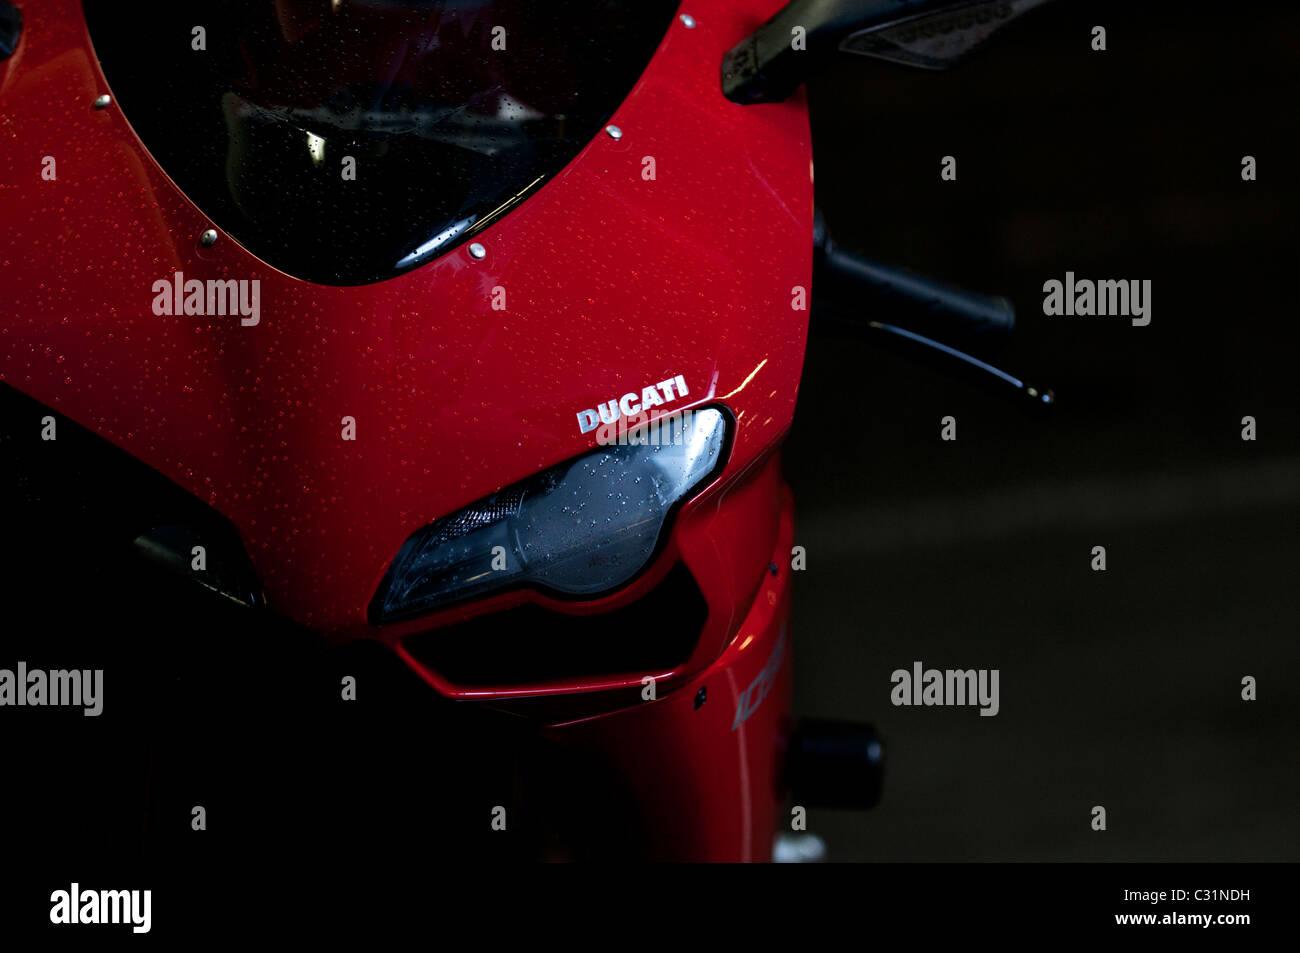 Ducati 1098s headlight close up - Stock Image